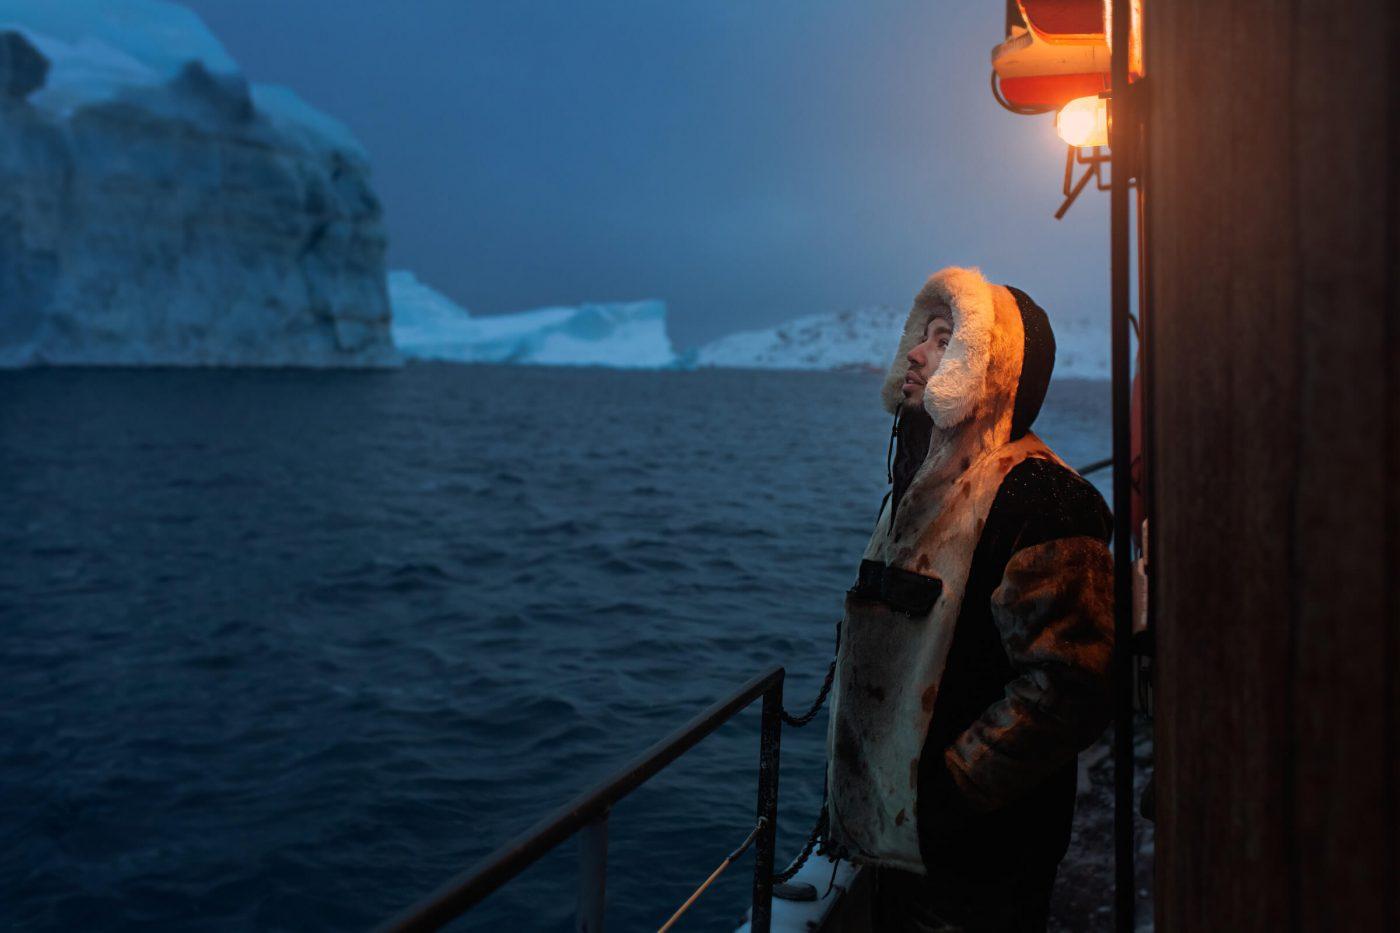 Canadian social media influencer Siya Zarrabi on an iceberg boat tour in Ilulissat in Greenland. By Rebecca Gustafsson